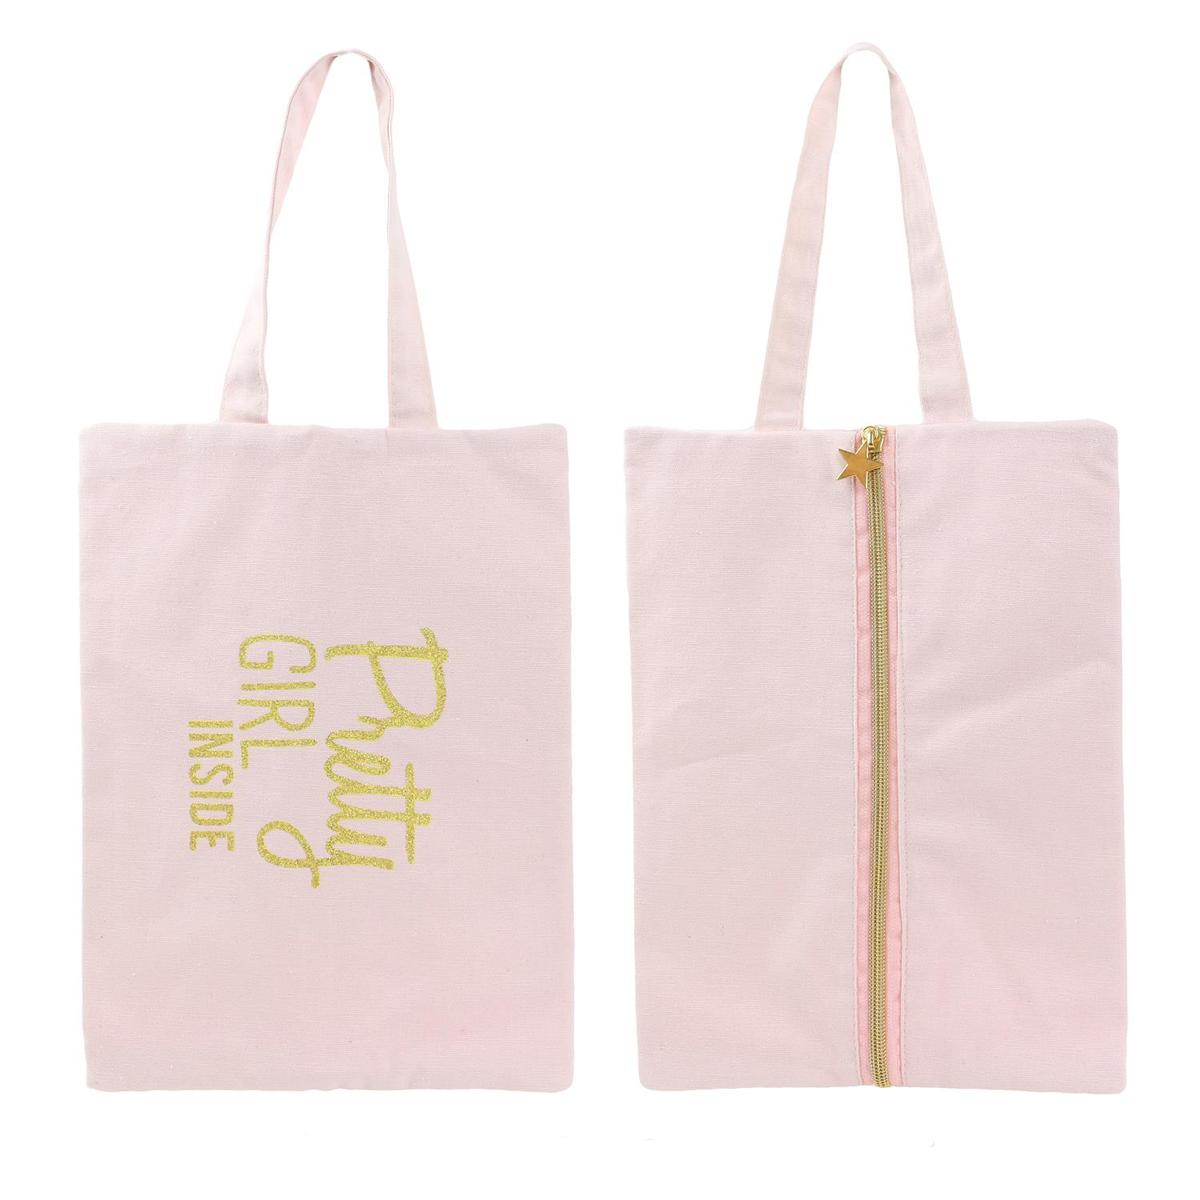 Pochette plate coton \'Messages\' rose (Pretty girl inside) - 30x21 cm - [Q3925]